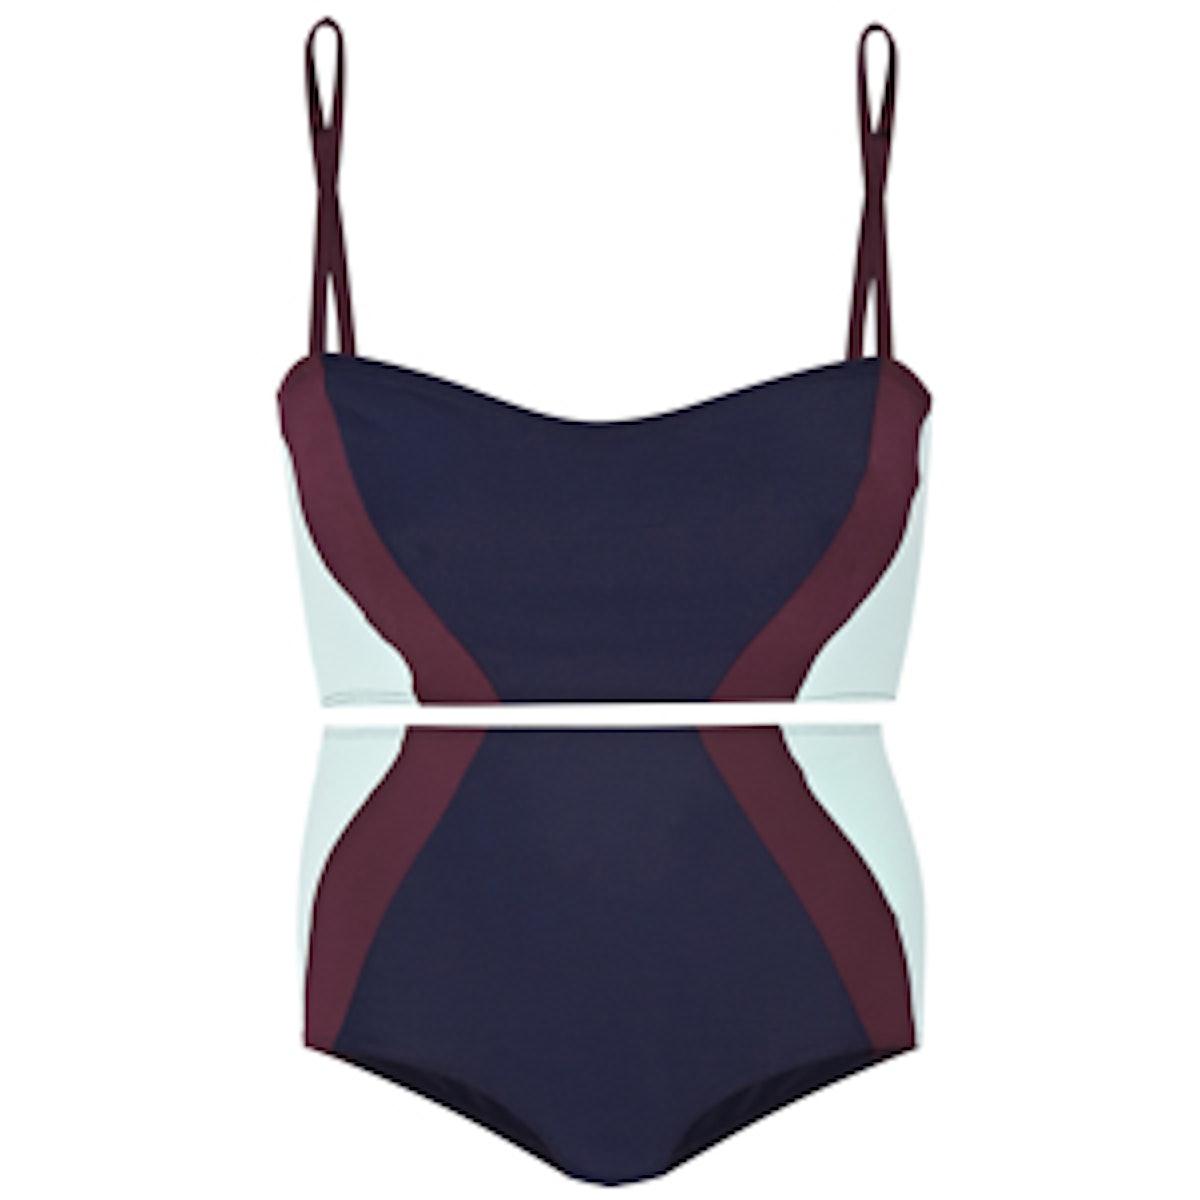 Perry Color-Block Bikini